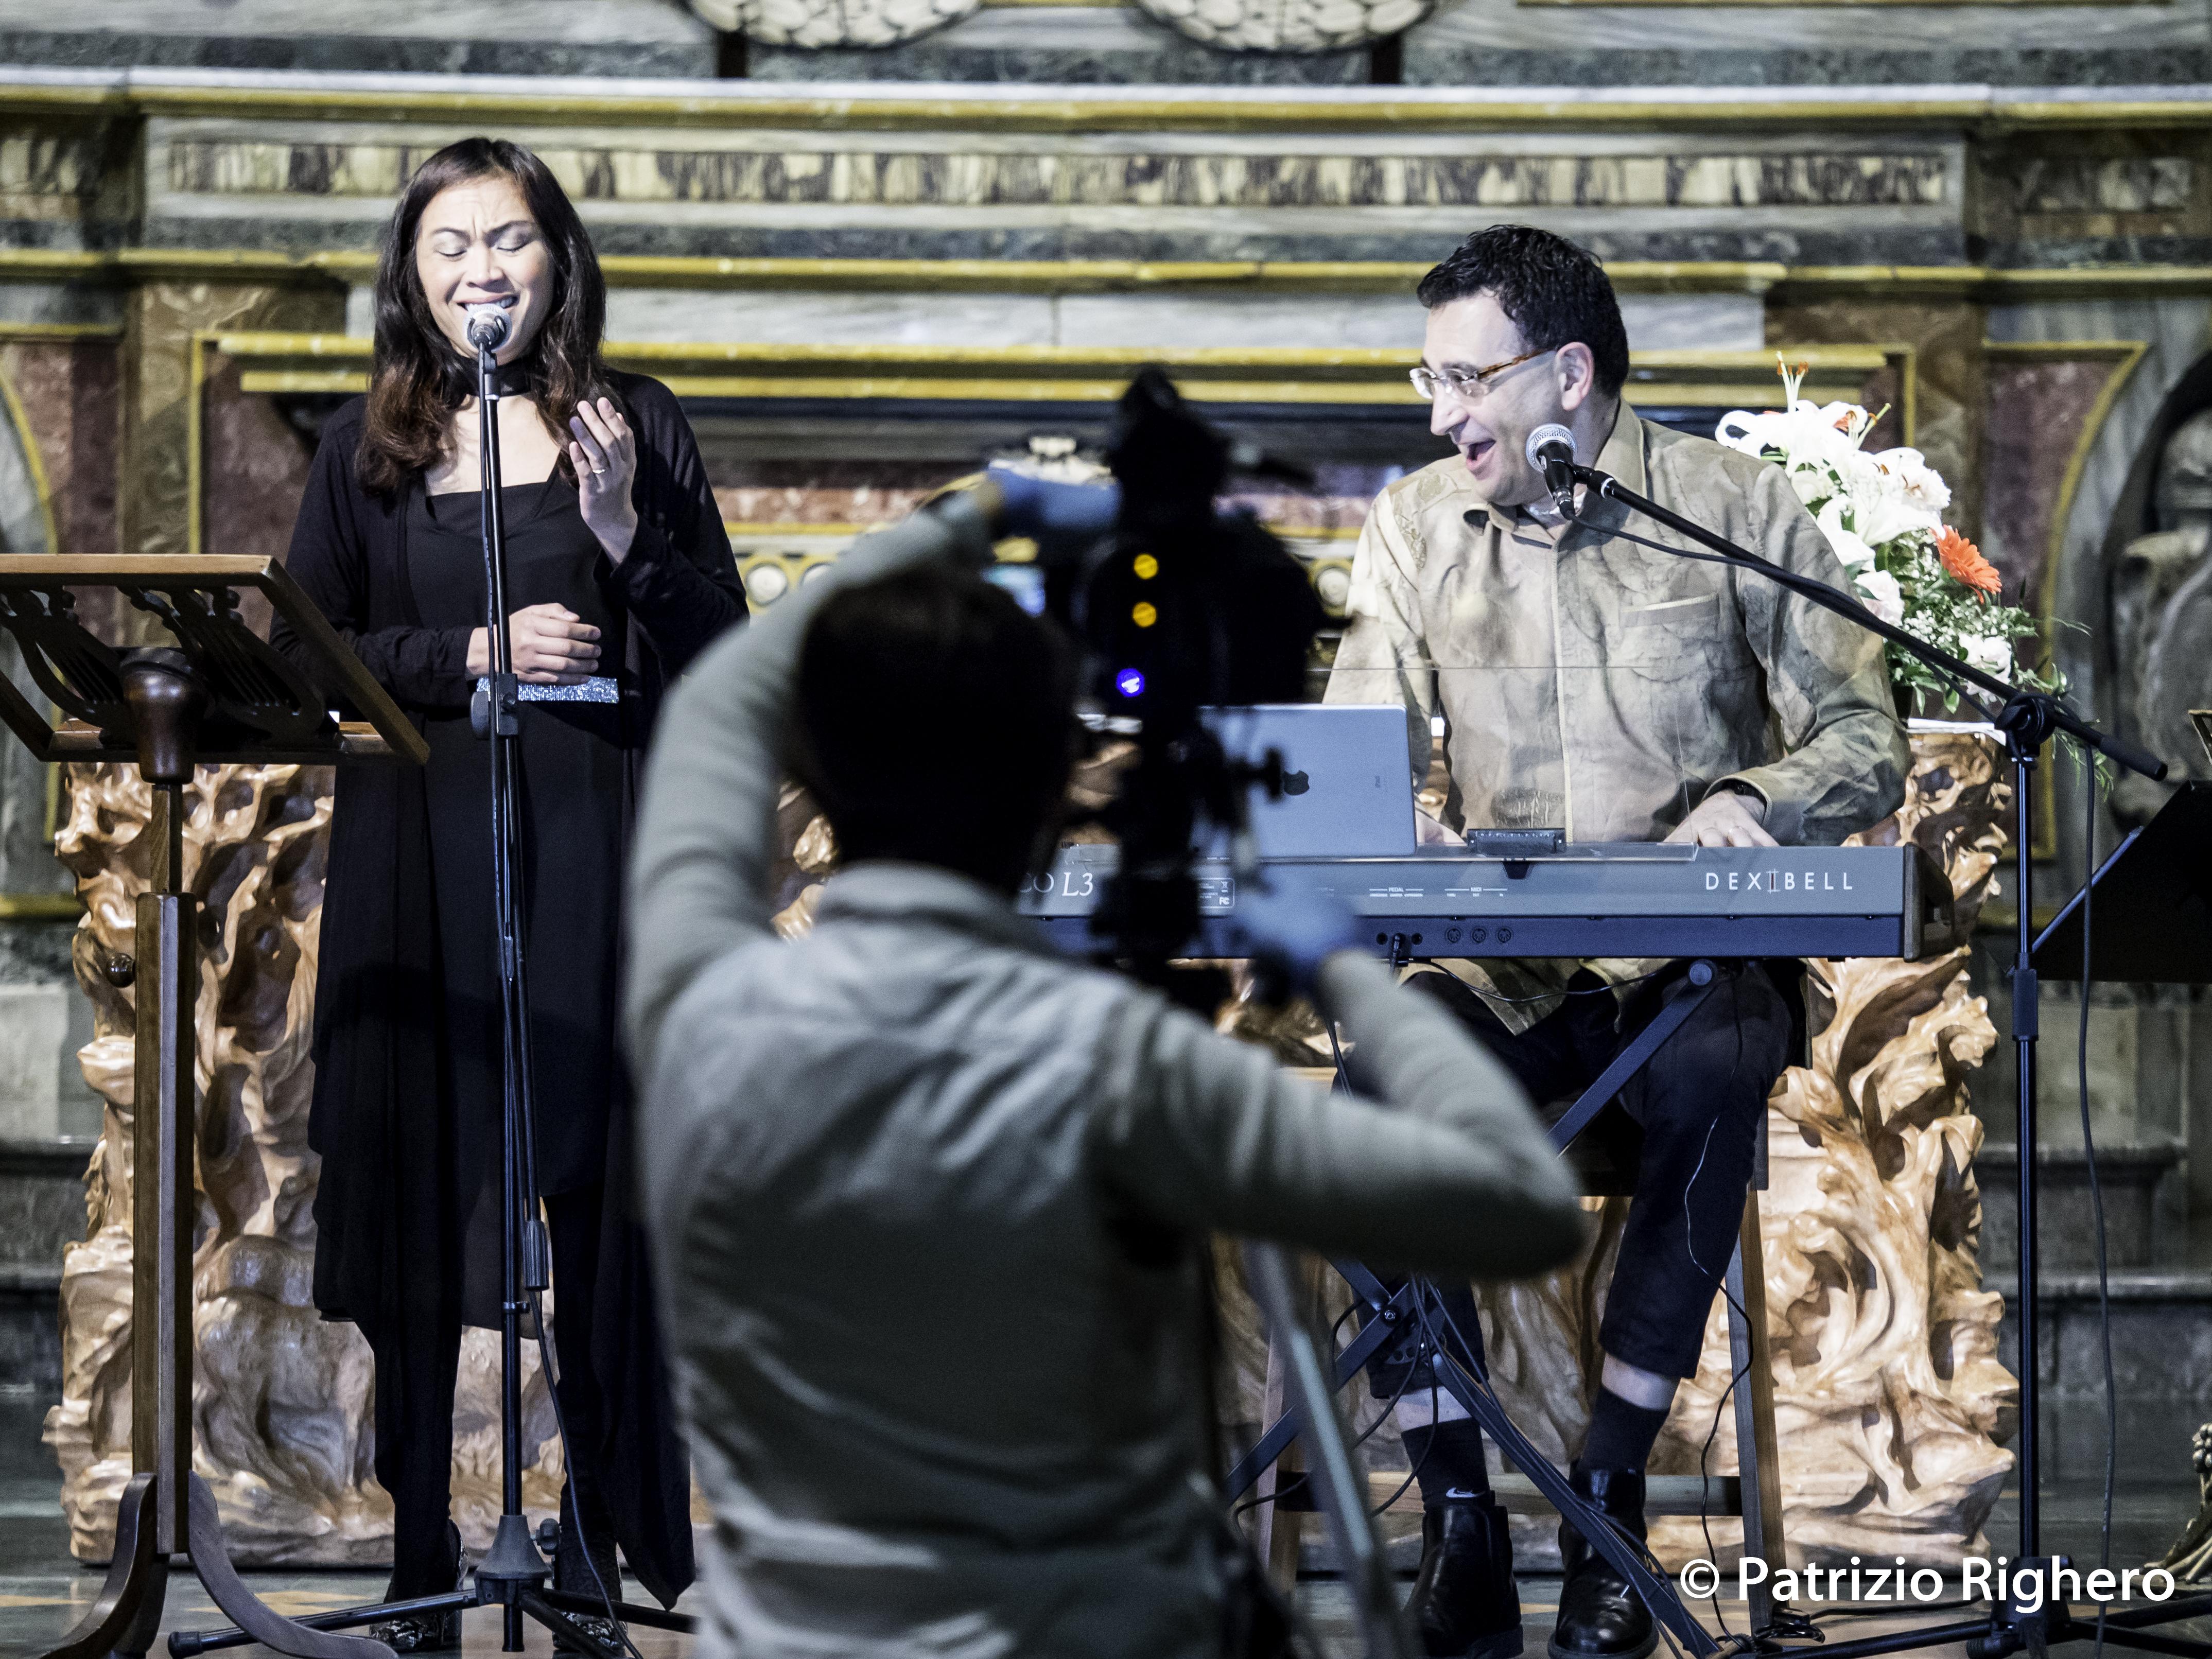 CREDIAMOCI - Live concert